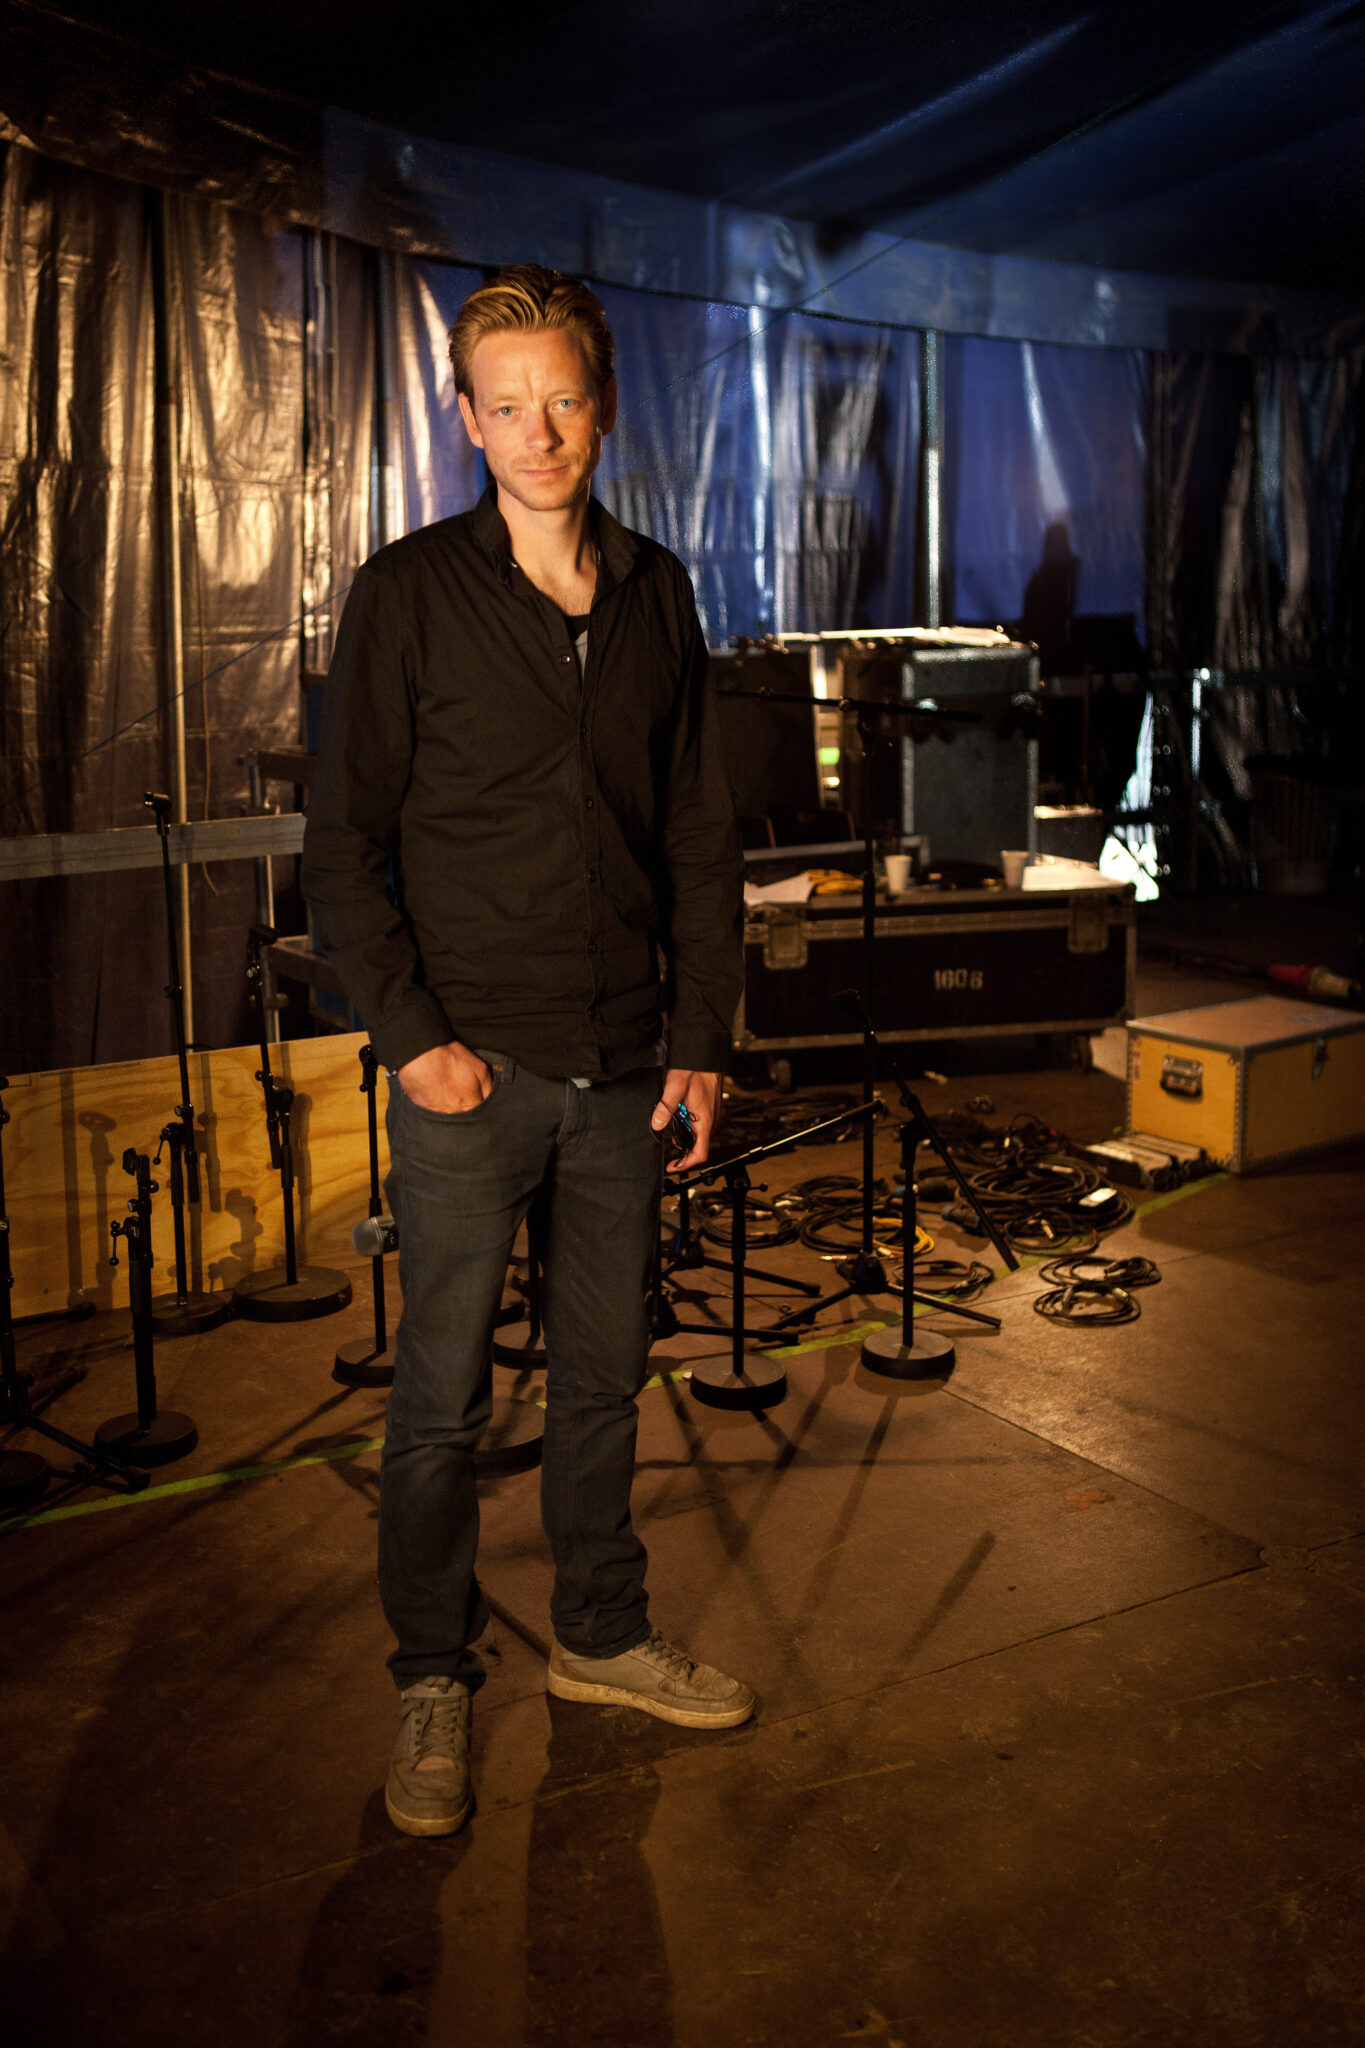 Portræt af Smukfest Chef Claus Visby